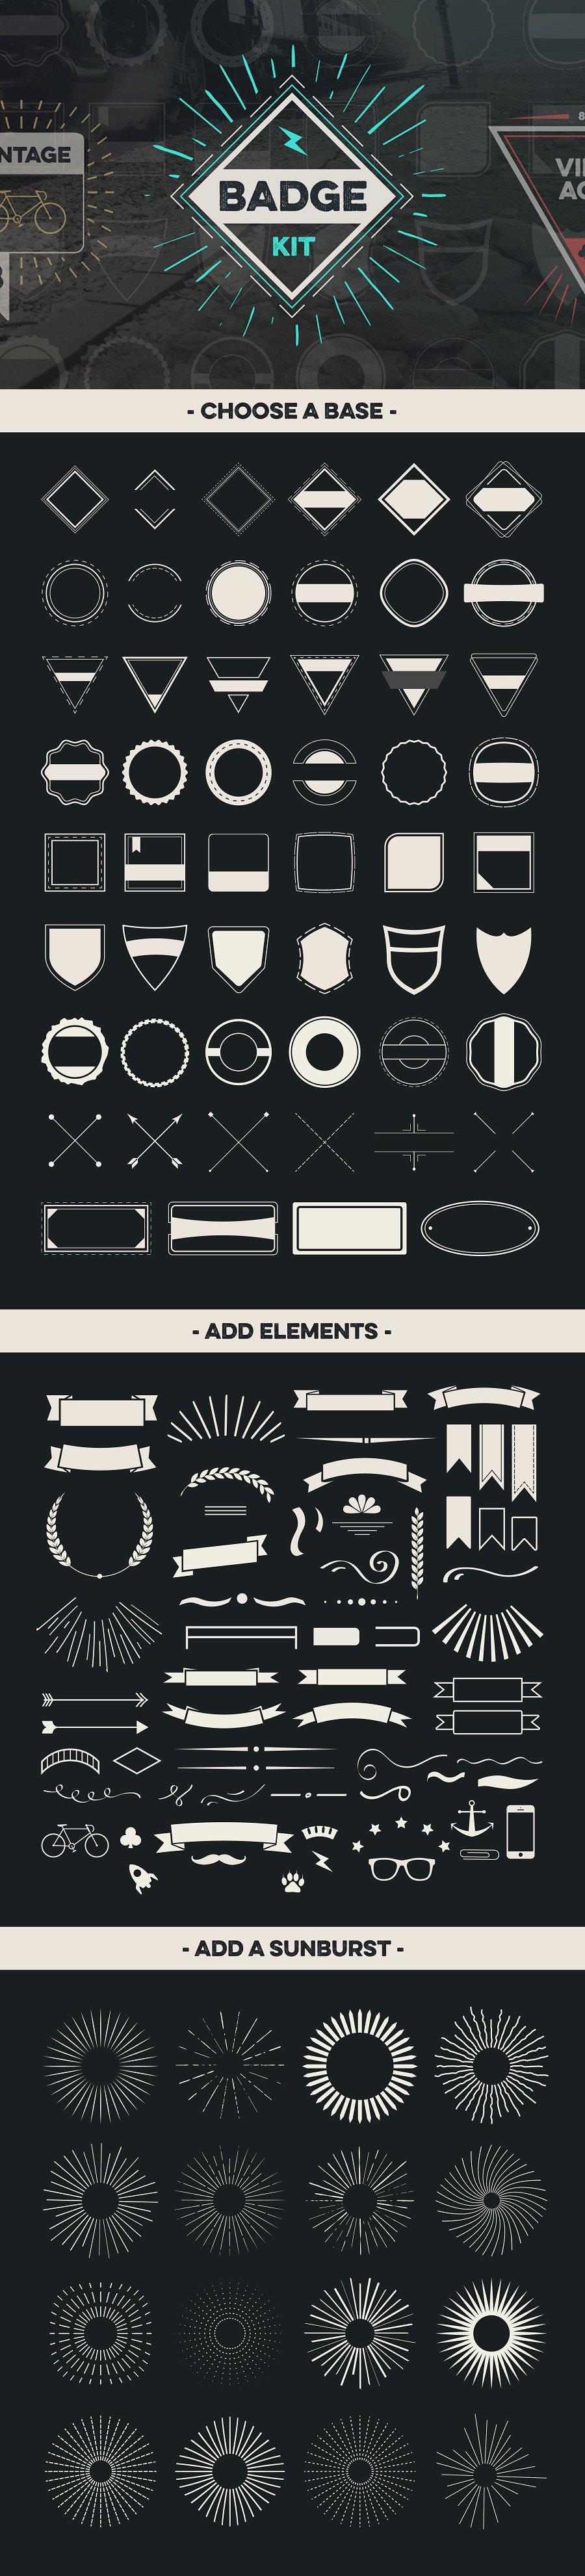 Badge Creator Kit Vol Template EPS AI Logo Templates - Badge maker template